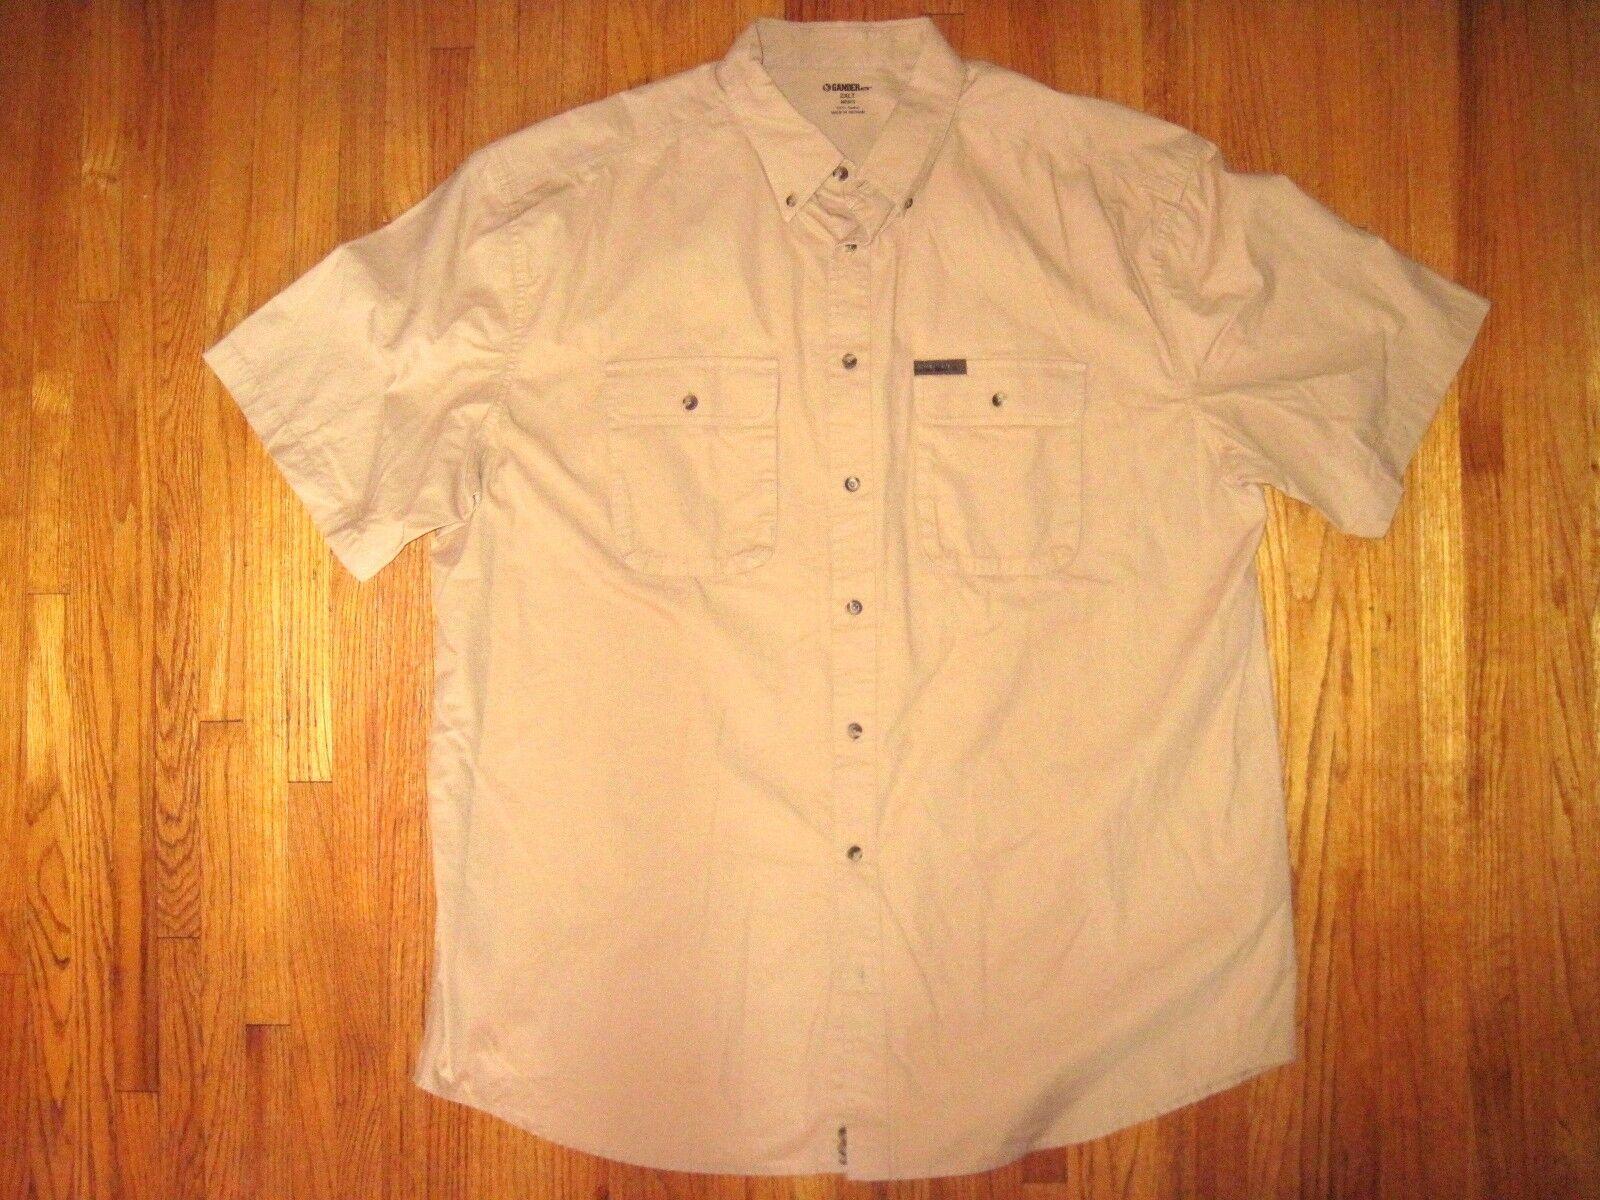 Big & Tall Gander Mt Khaki Heavy Cotton Short Sleeve Casual Shirt Size 2XLT New